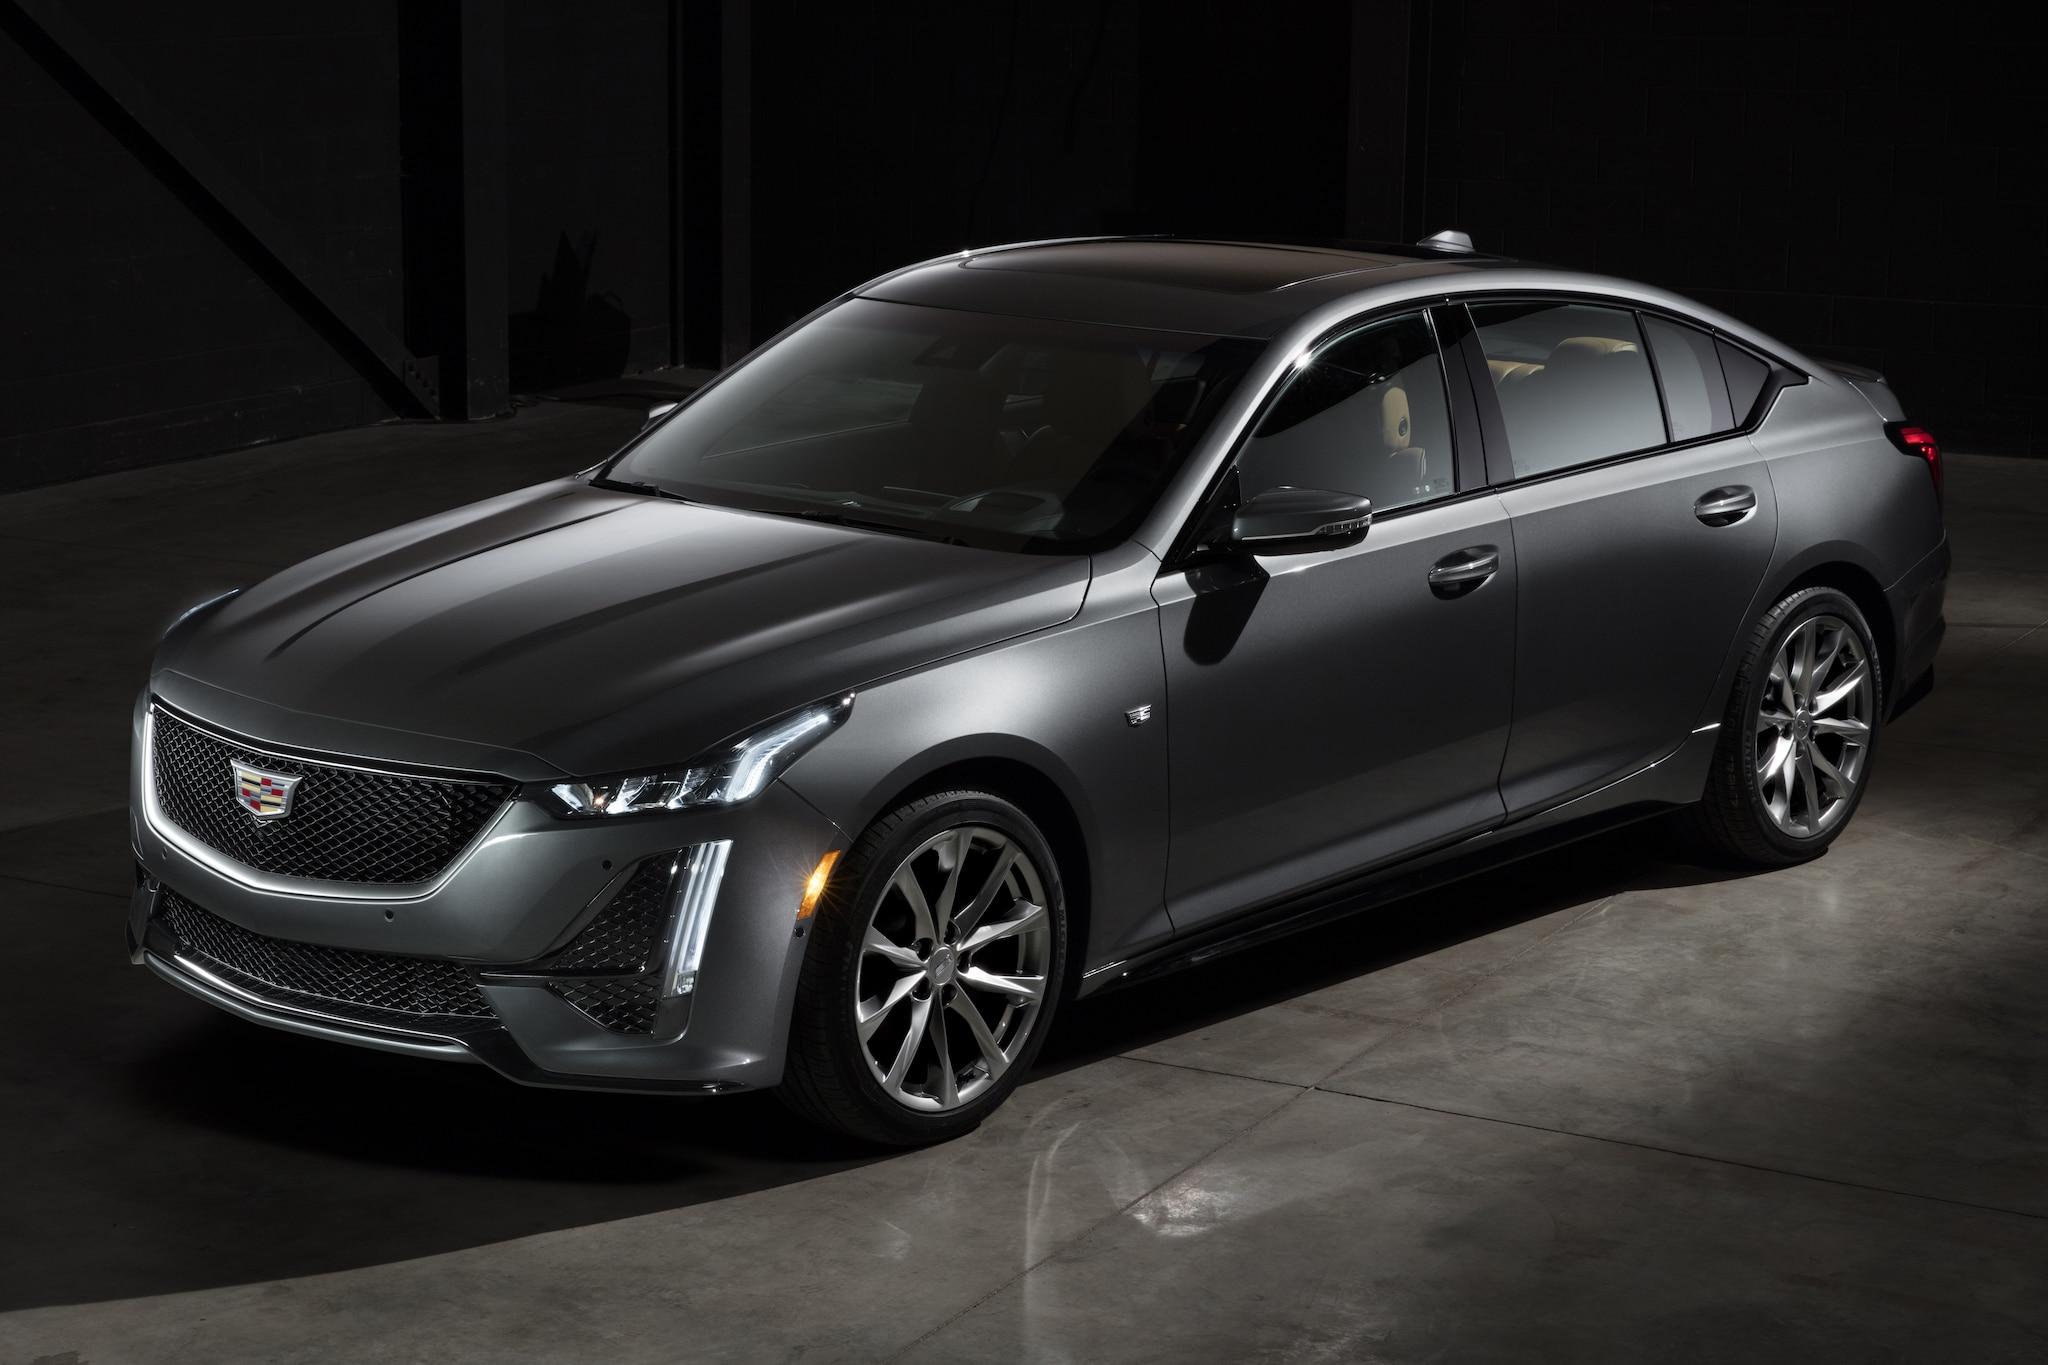 2020 Cadillac CT5 Sedan: What We Know | Automobile Magazine